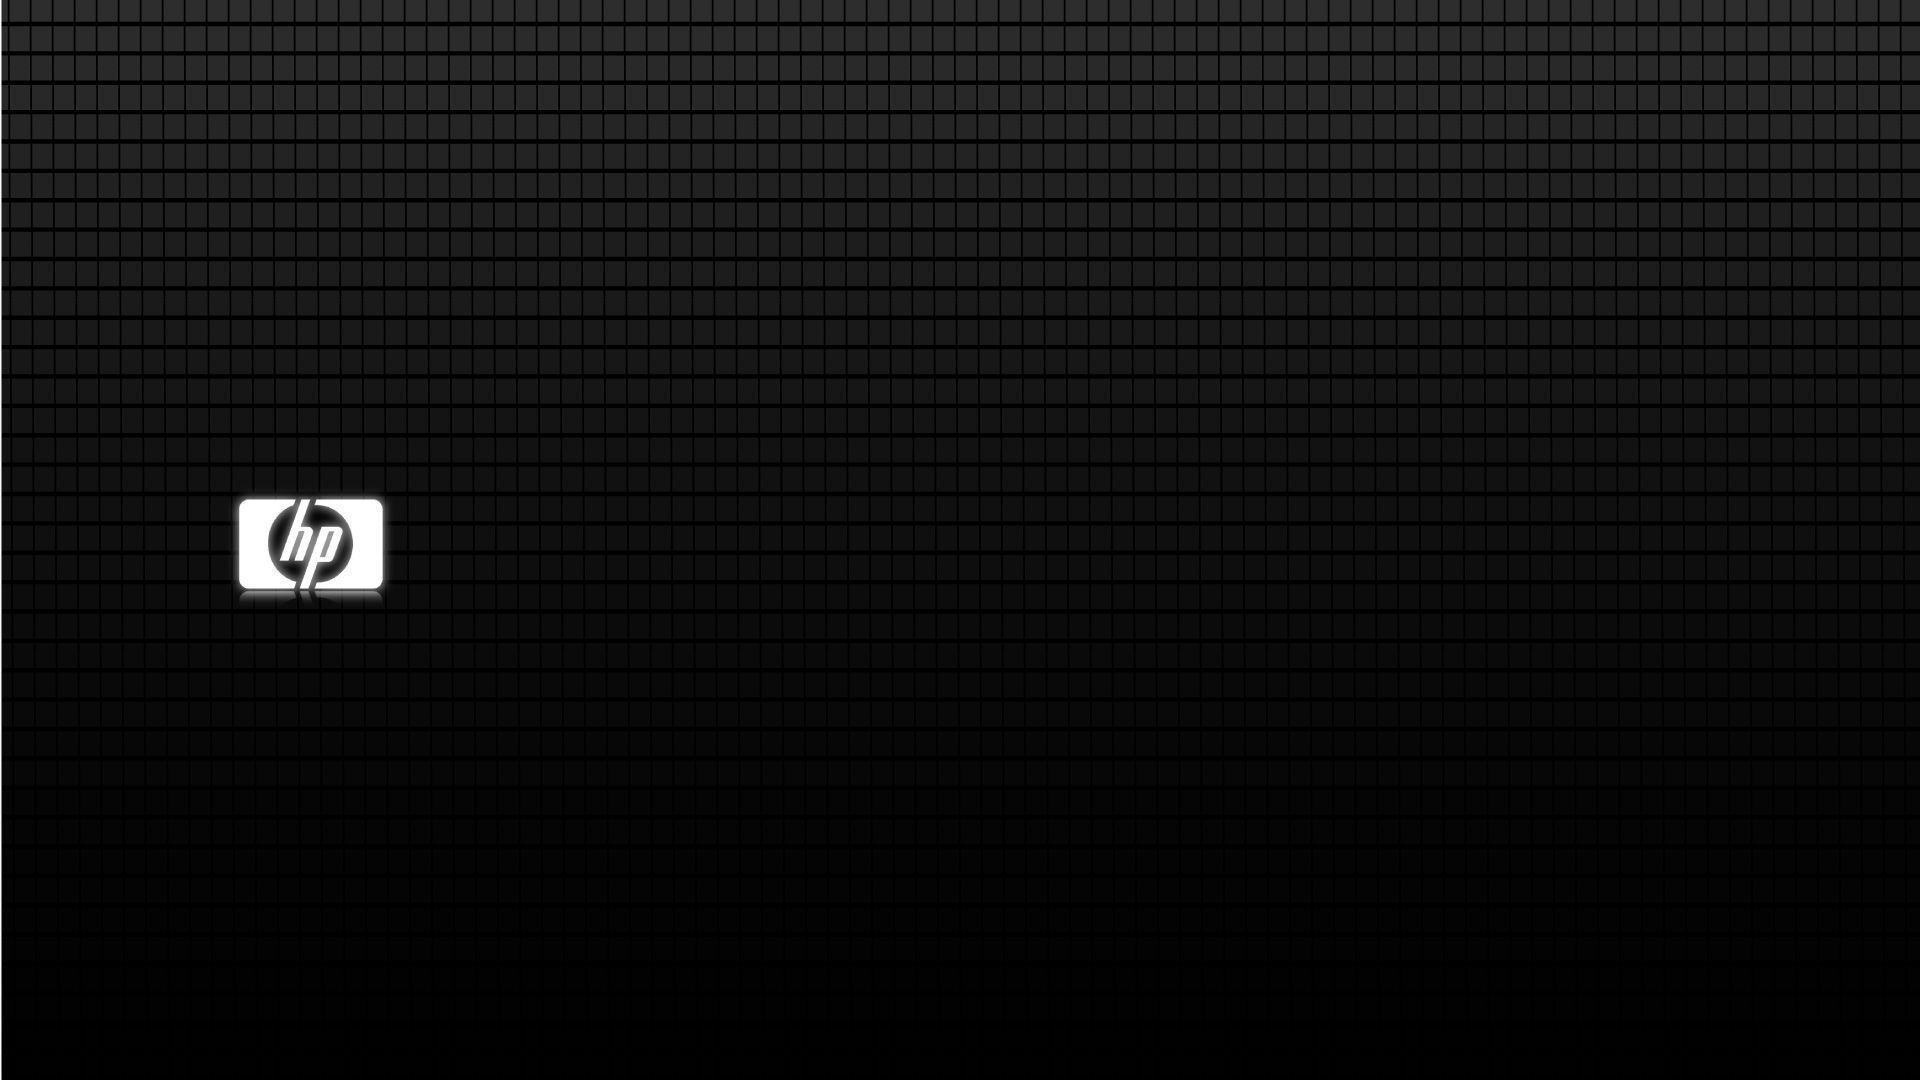 Hp Wallpaper 7 9167 HD Wallpaper | Wallroro.